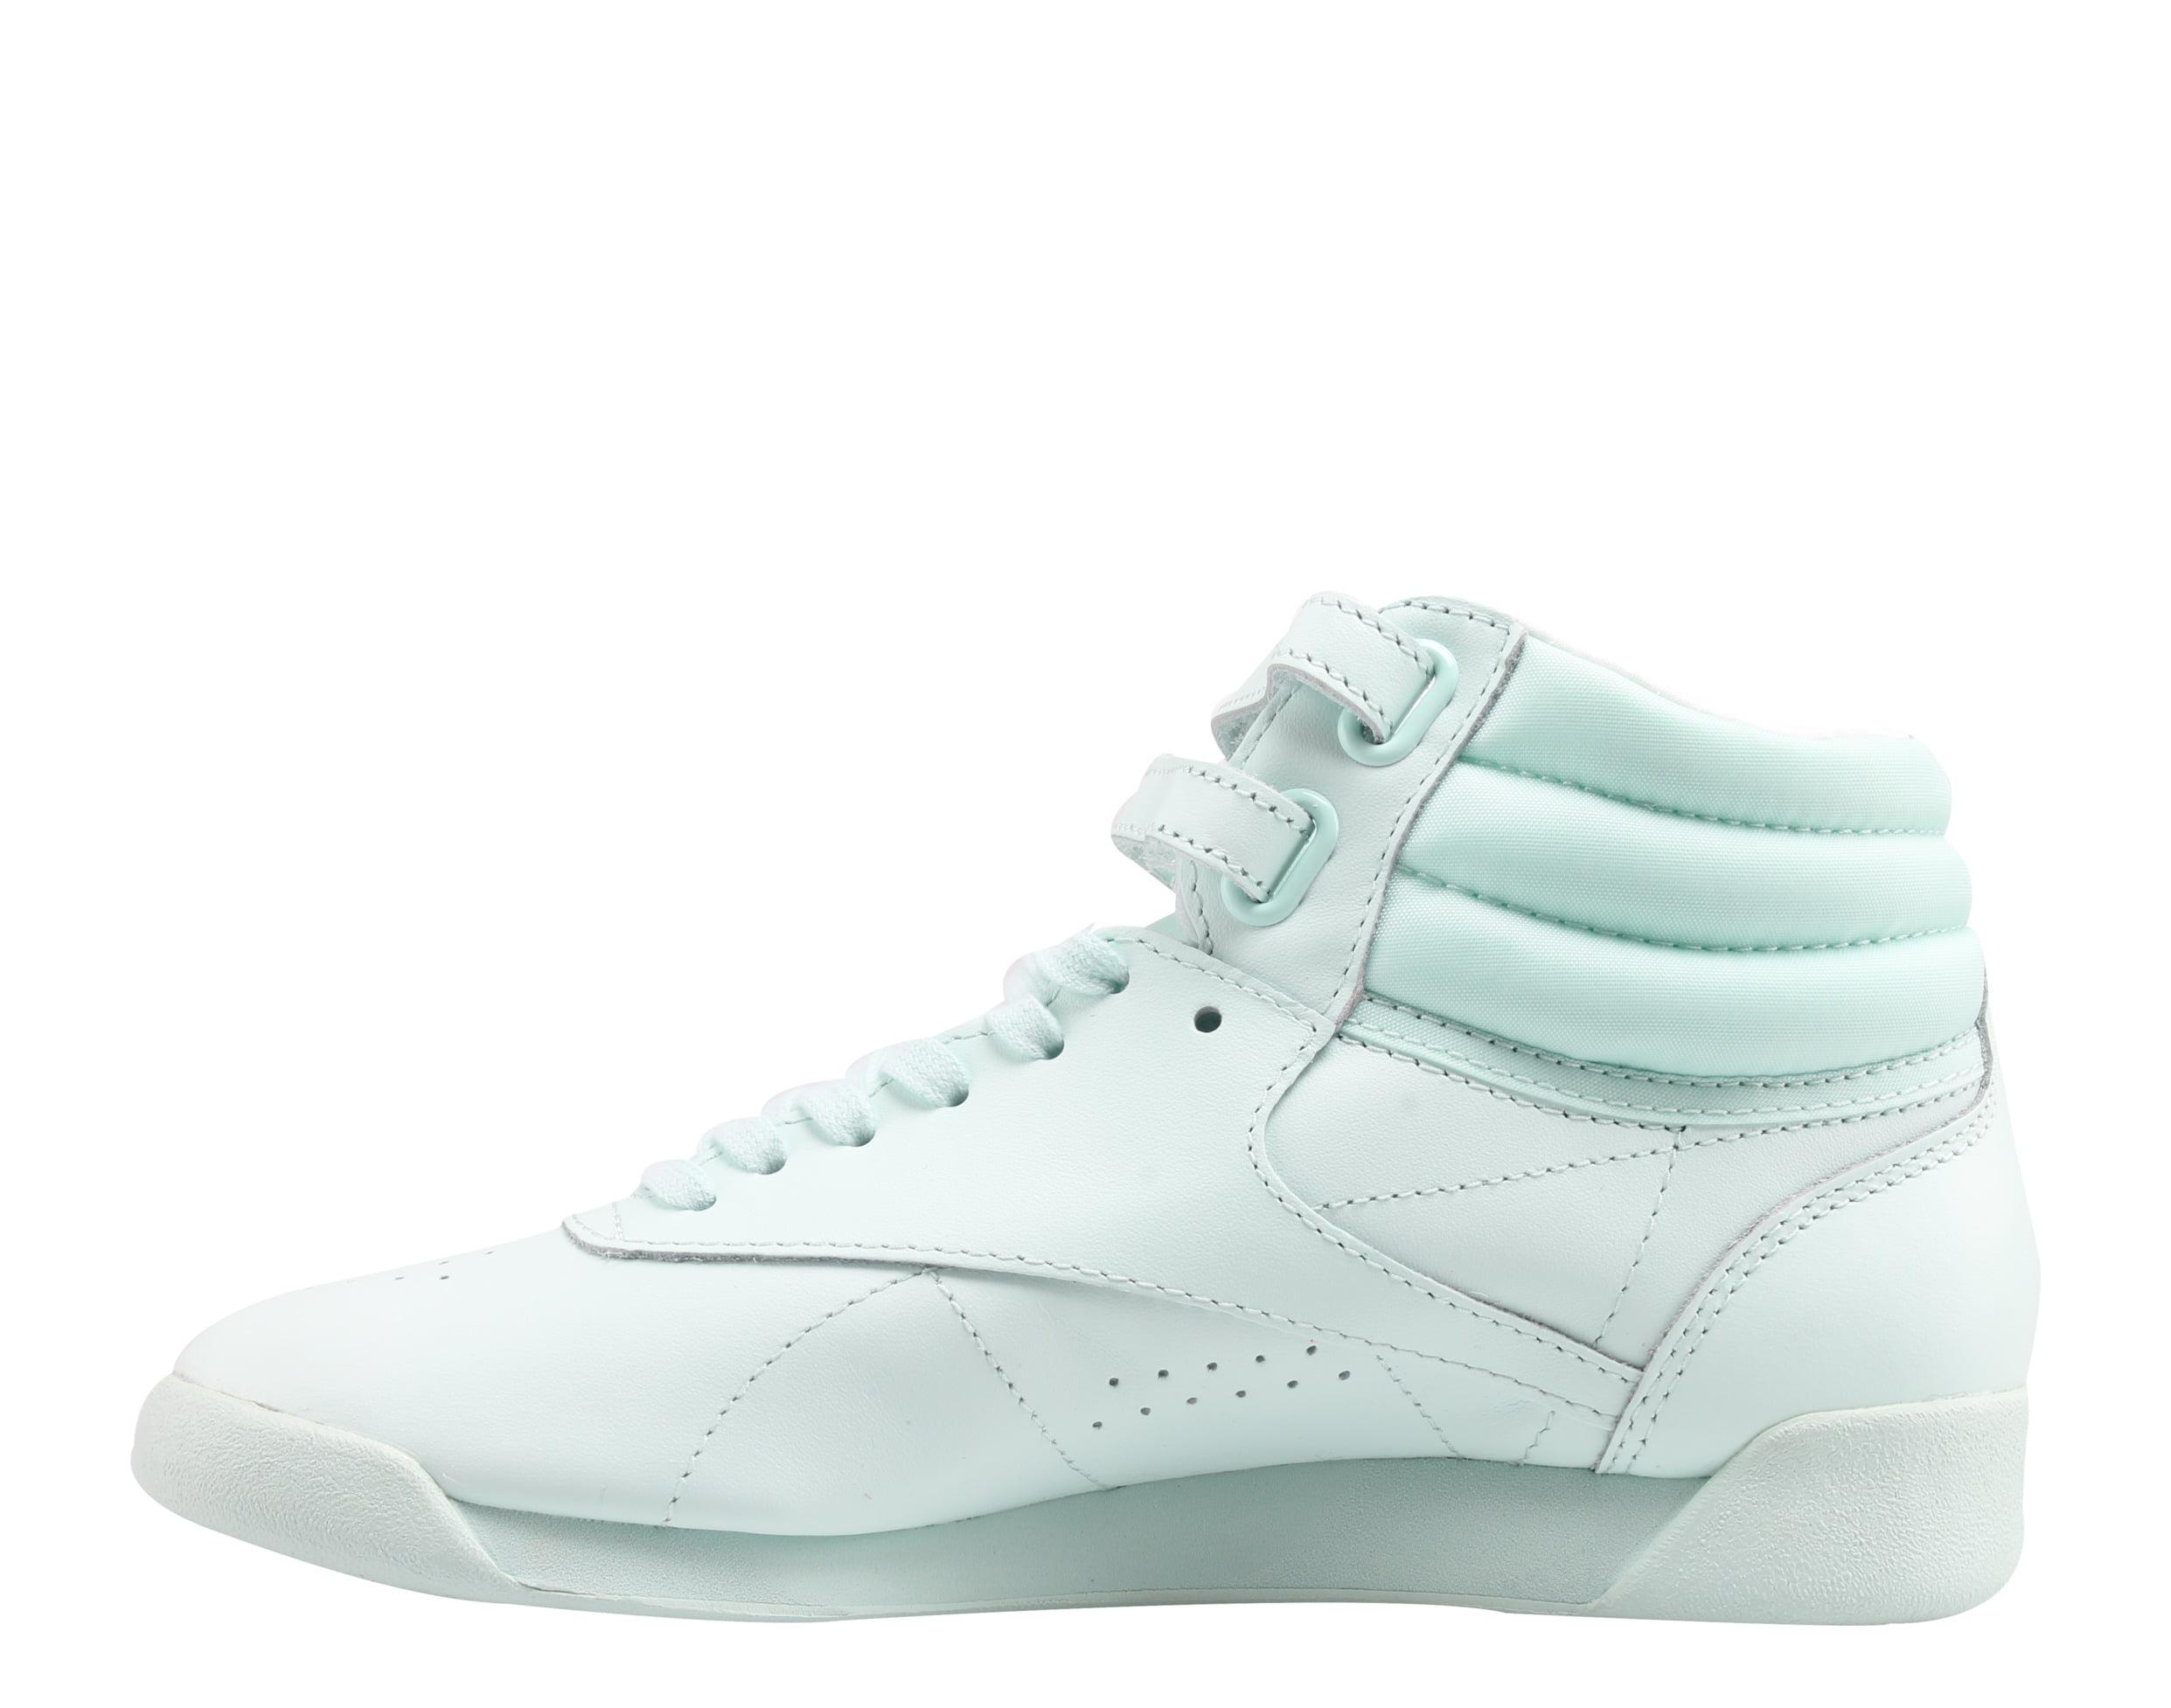 Reebok Classic Freestyle Hi Color Bomb Mist/White Womens Shoes BS7863